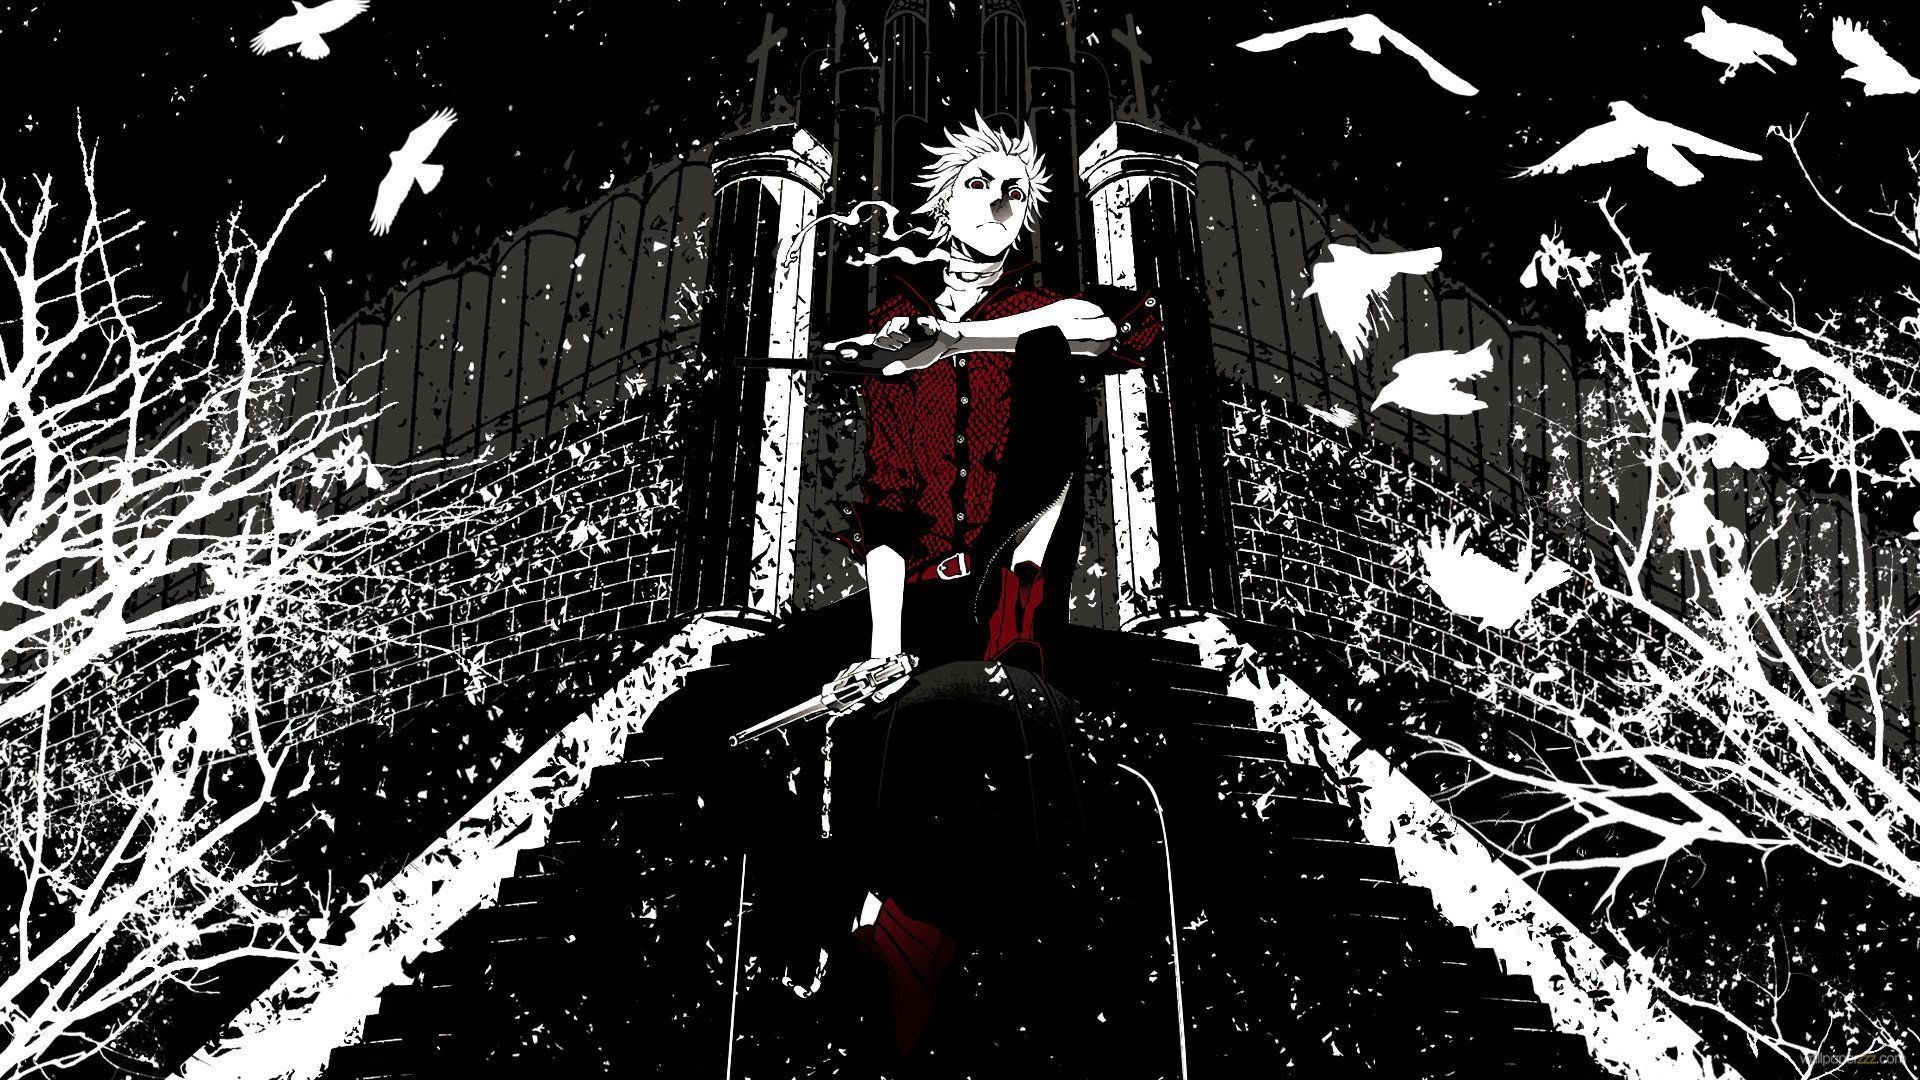 Dark Anime Wallpapers